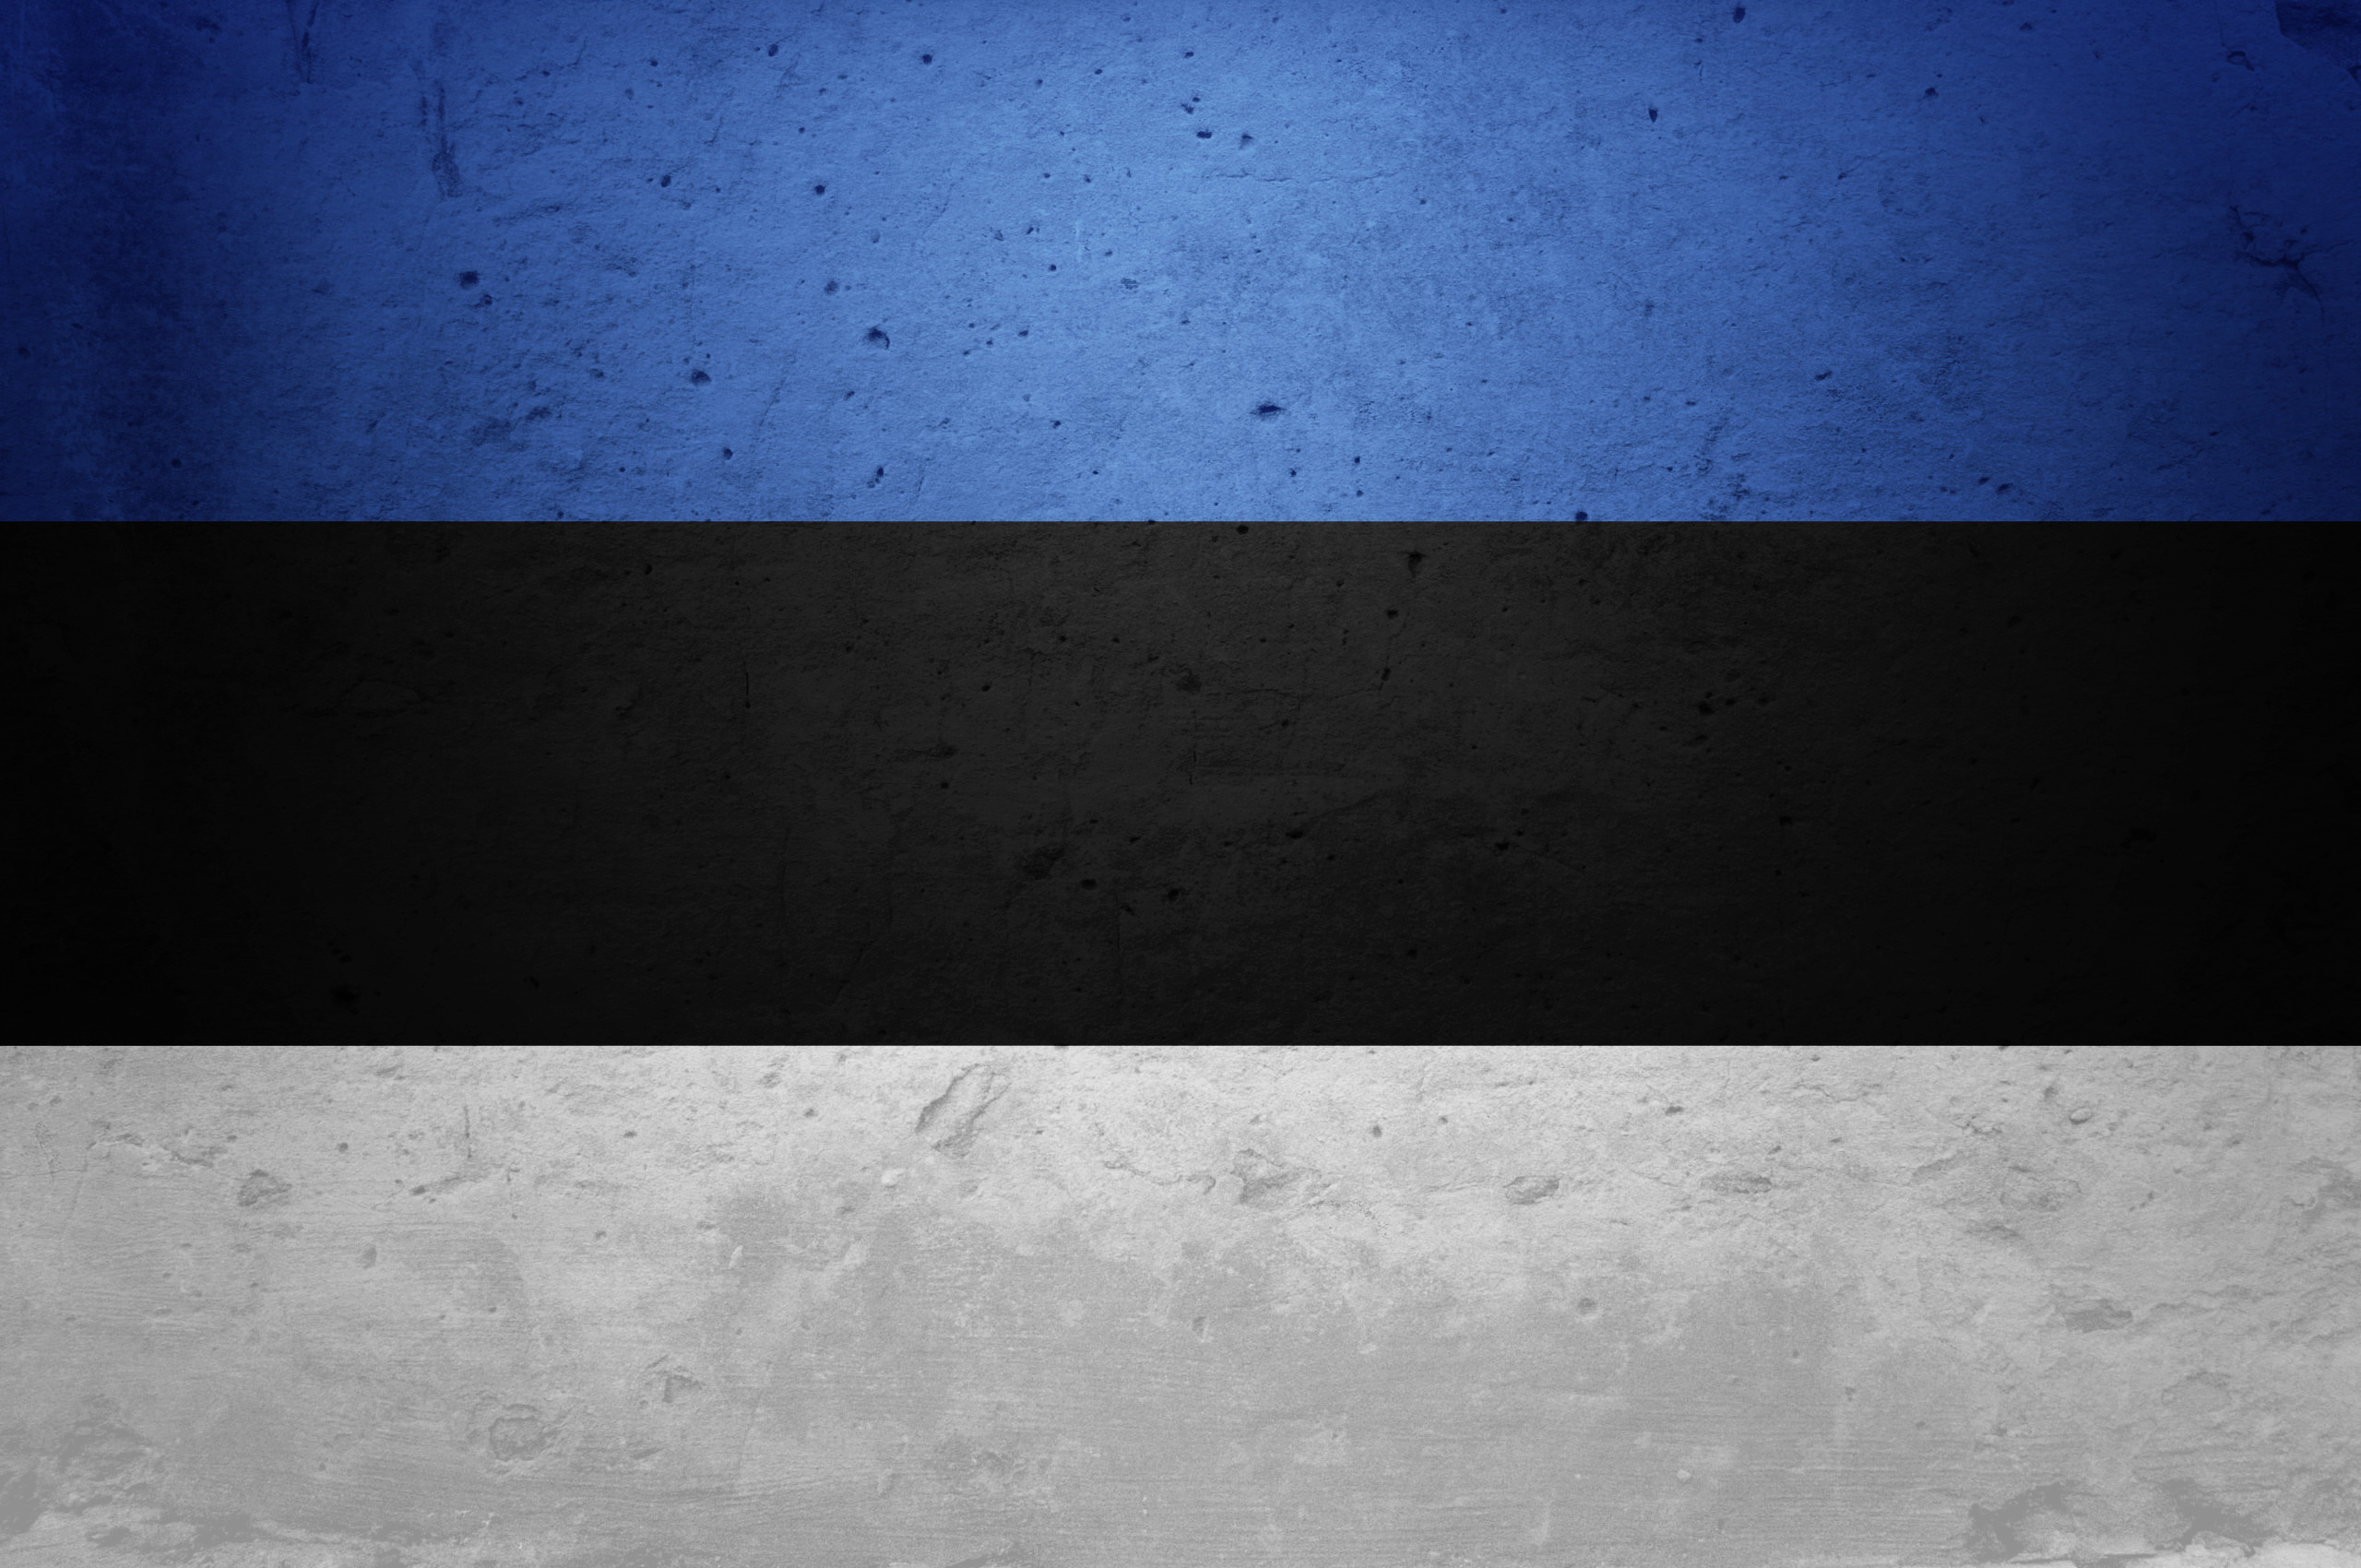 Flag Of Estonia HD Wallpaper Background Image 2560x1700 ID 2560x1700